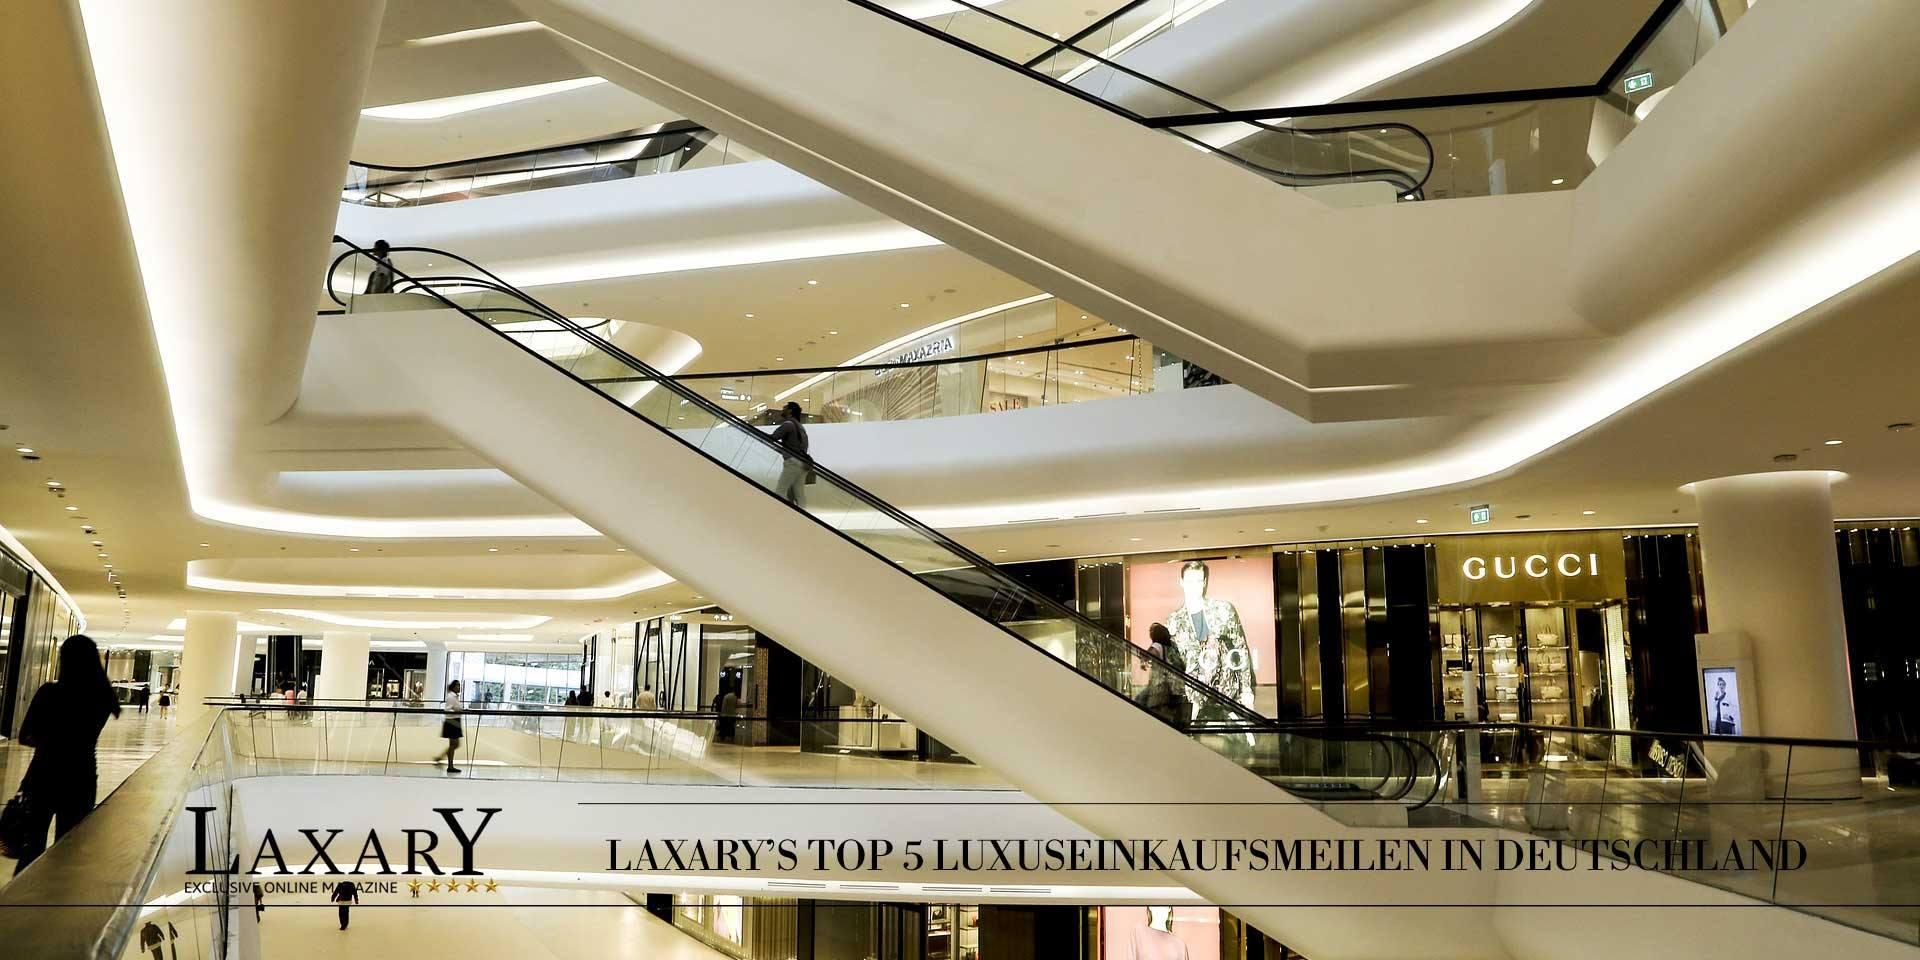 Hot Spots: Top Luxus Shopping in Deutschland